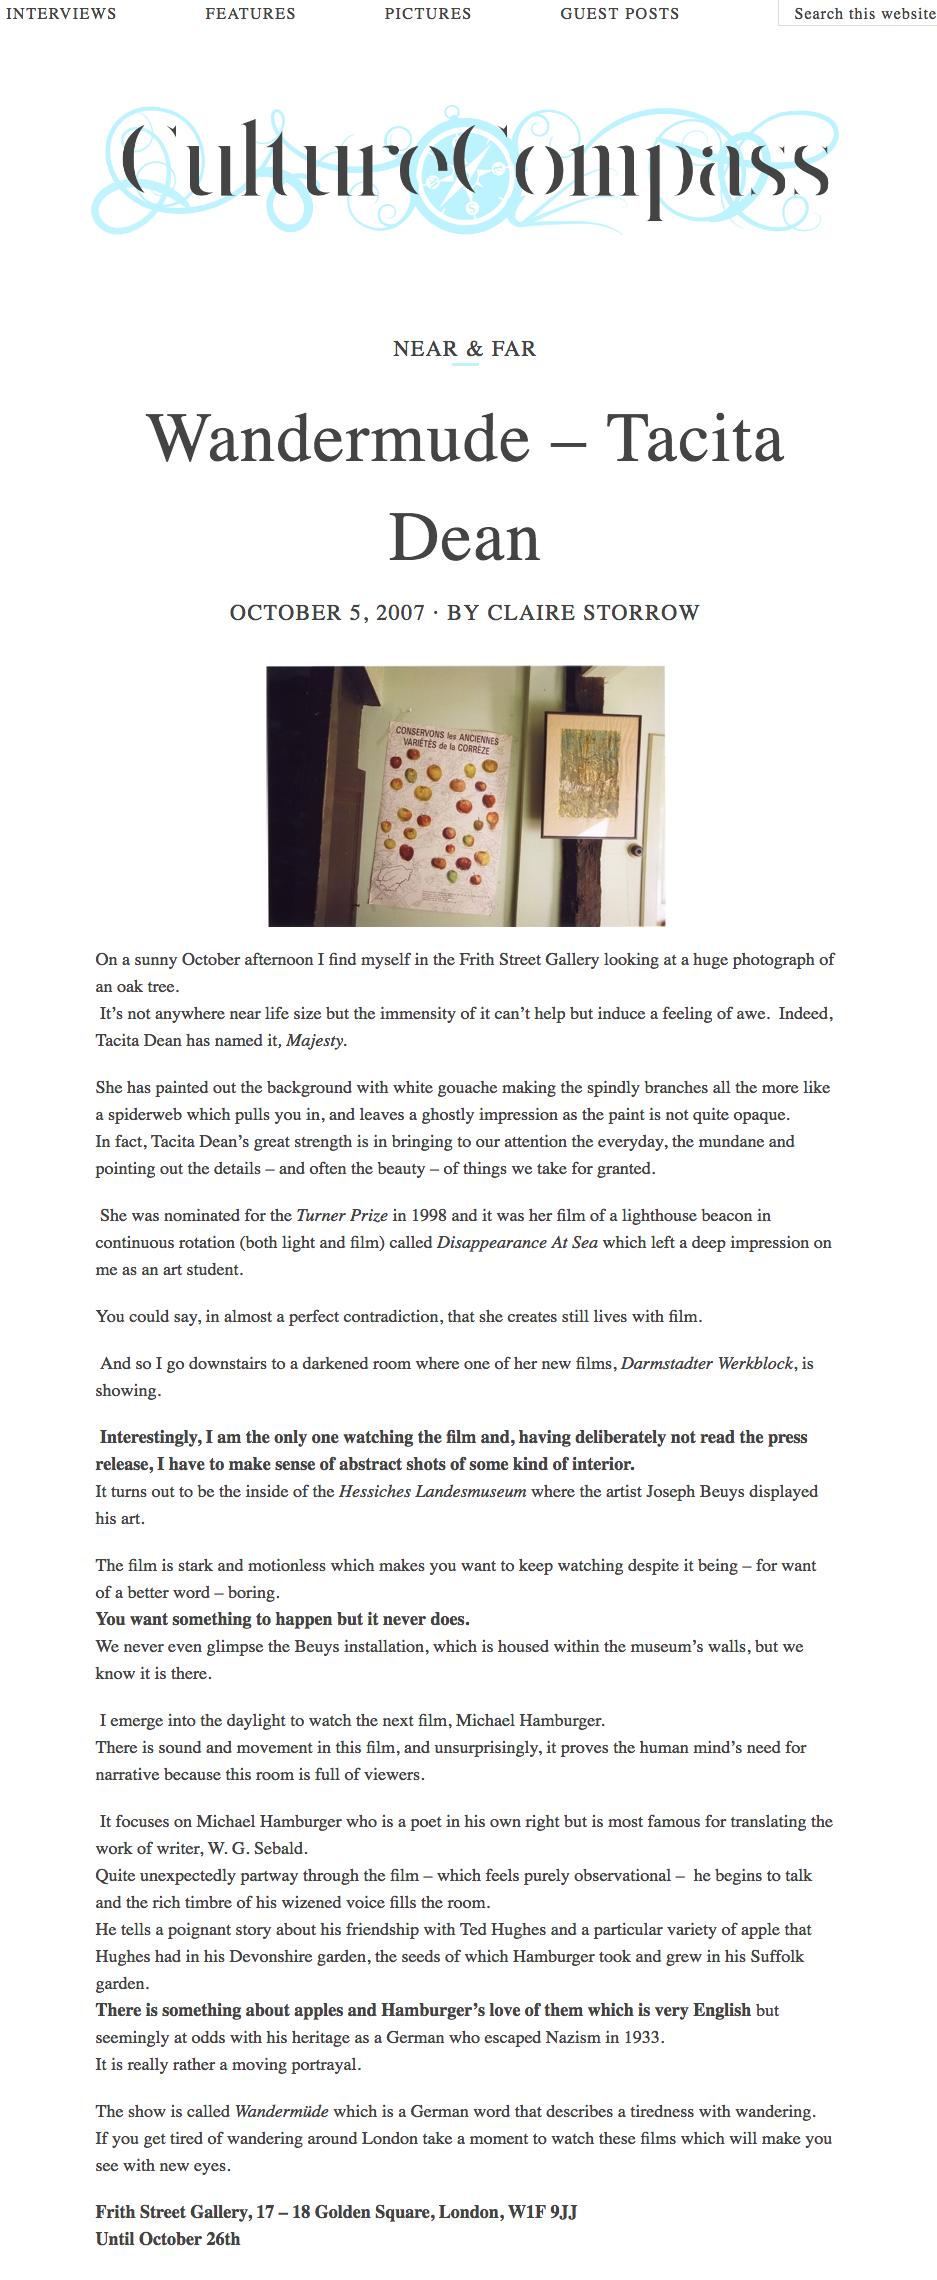 Wandermude - Tacita Dean   Frith Street Gallery   London Exhibition   Open Magazine   Tacita Dean copy.png